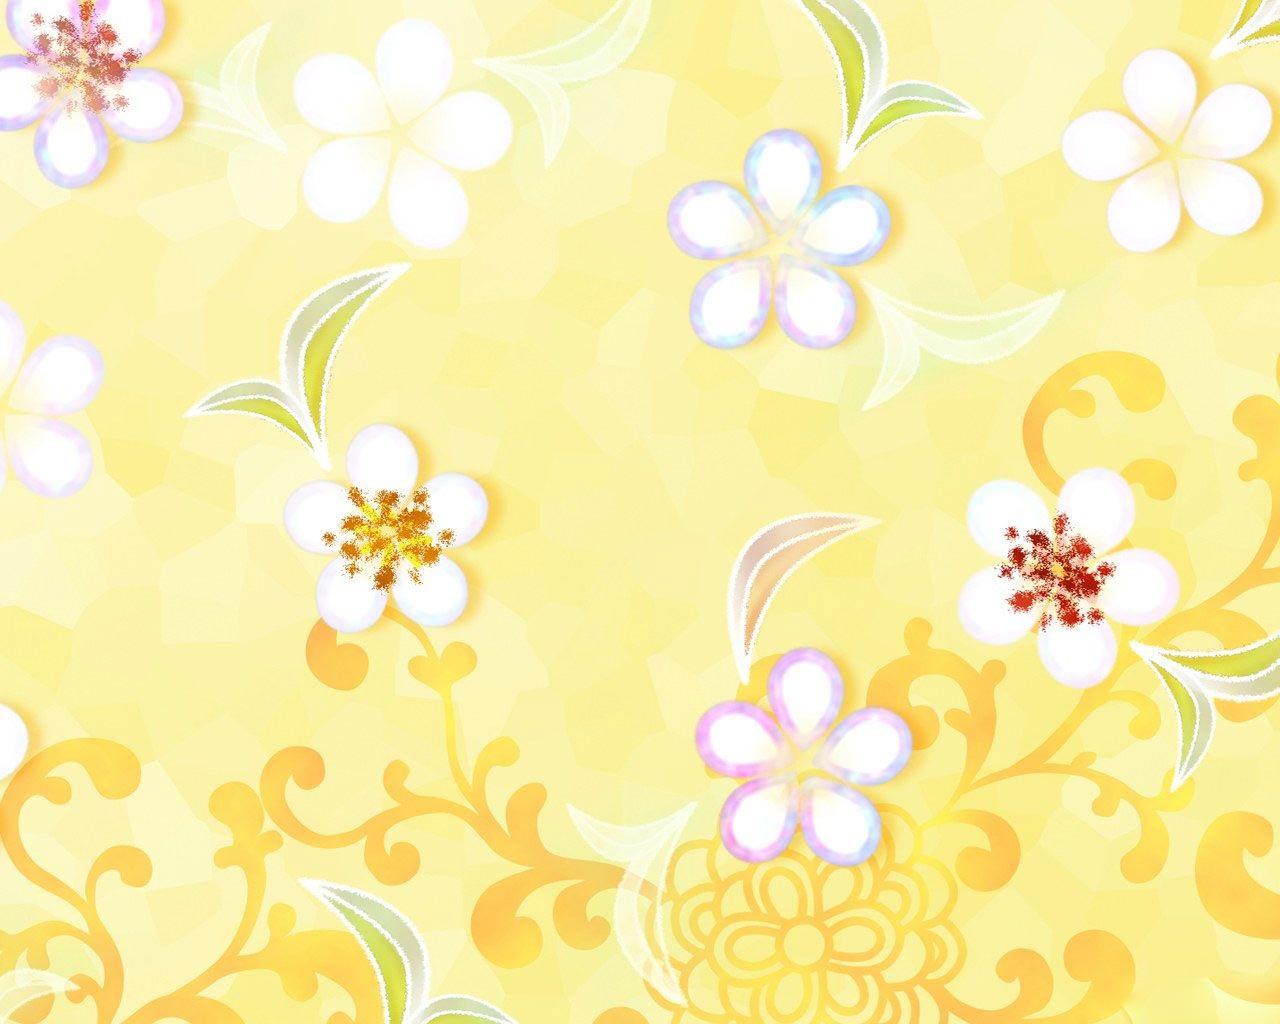 Free spring desktop wallpaper wallpaperswallpaper desktop free spring desktop wallpaper wallpaperswallpaper desktophigh definition wallpapers mightylinksfo Gallery